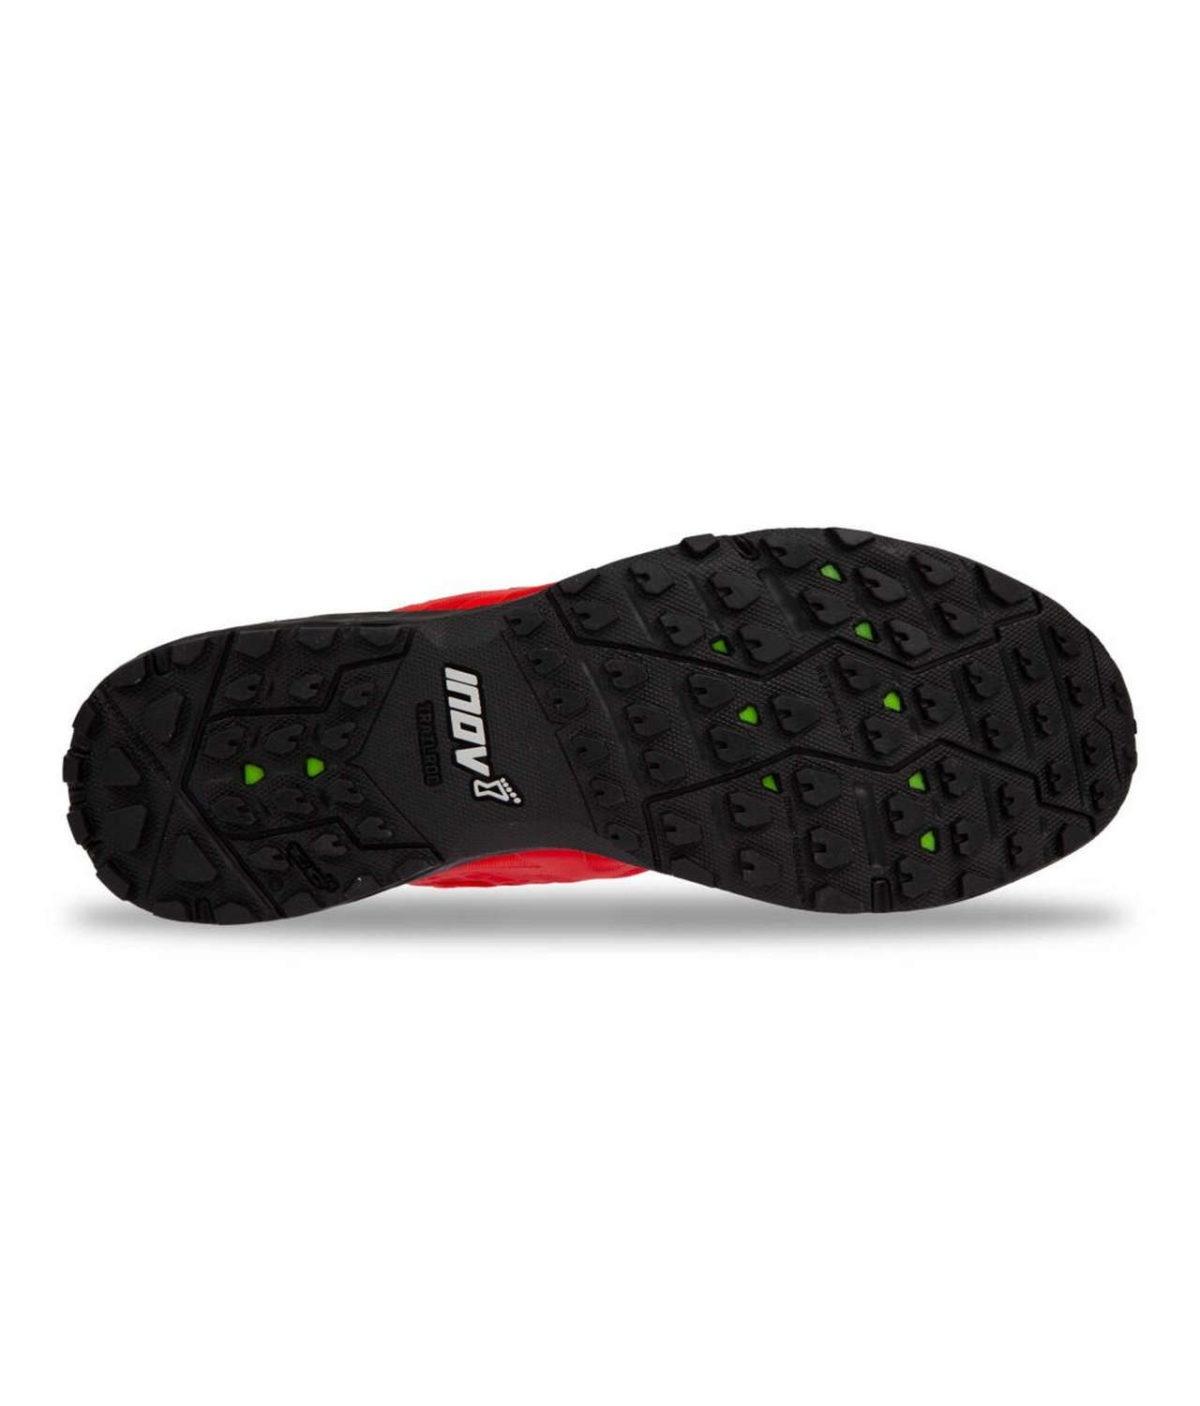 inov 8 Trailroc 285 trail shoe red black FastandLight 3 1